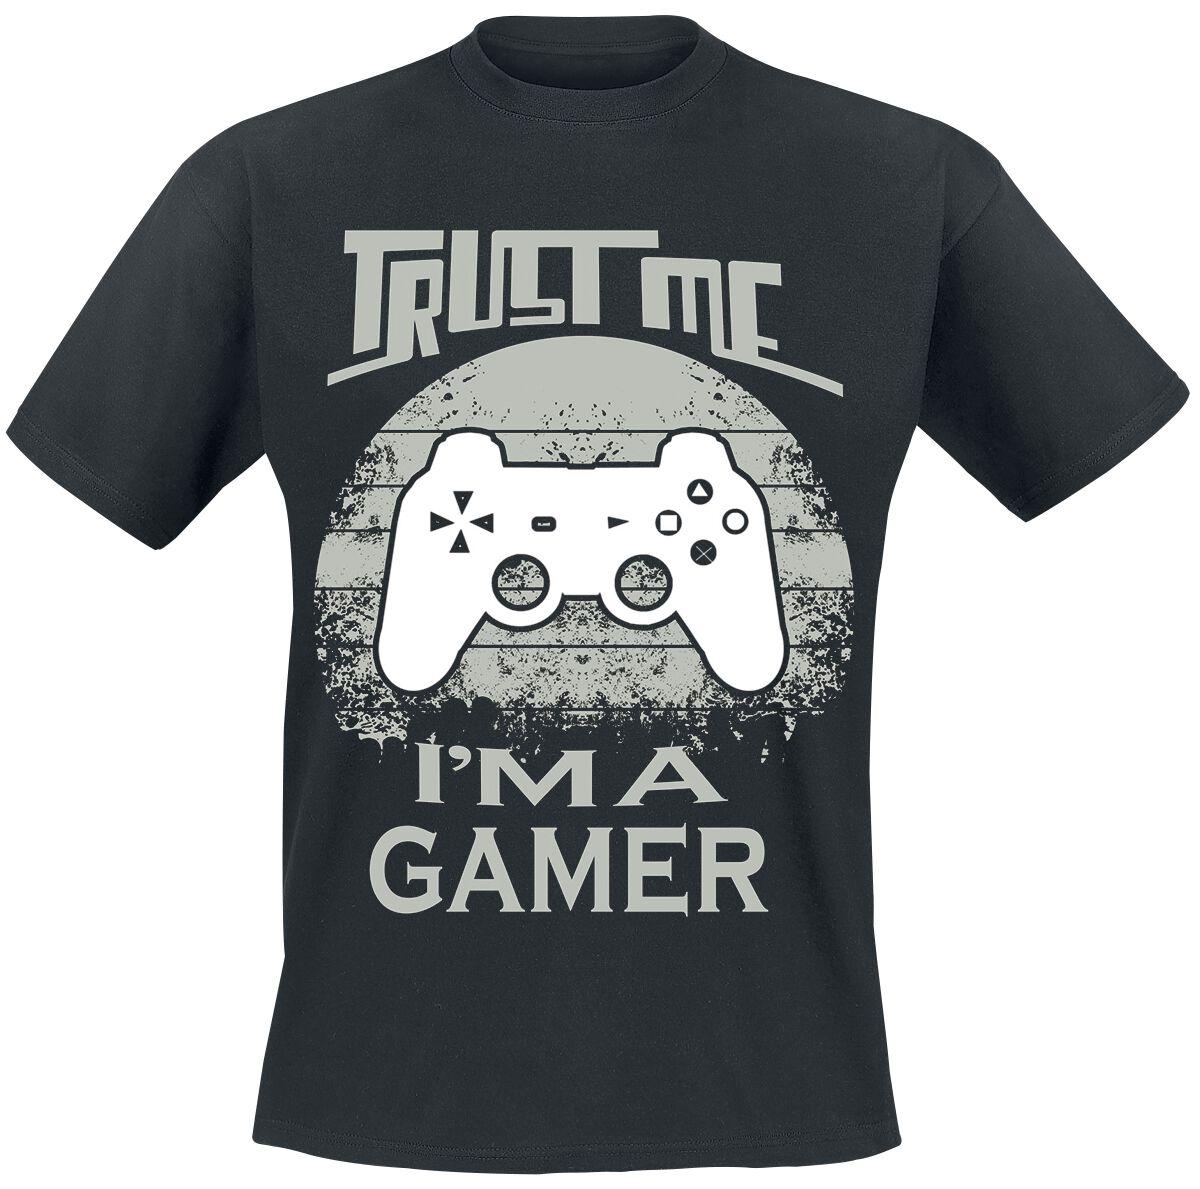 Trust me I'm a gamer Trust me I'm a gamer T-Shirt schwarz POD - Trust me I'm a gamer - Gildan